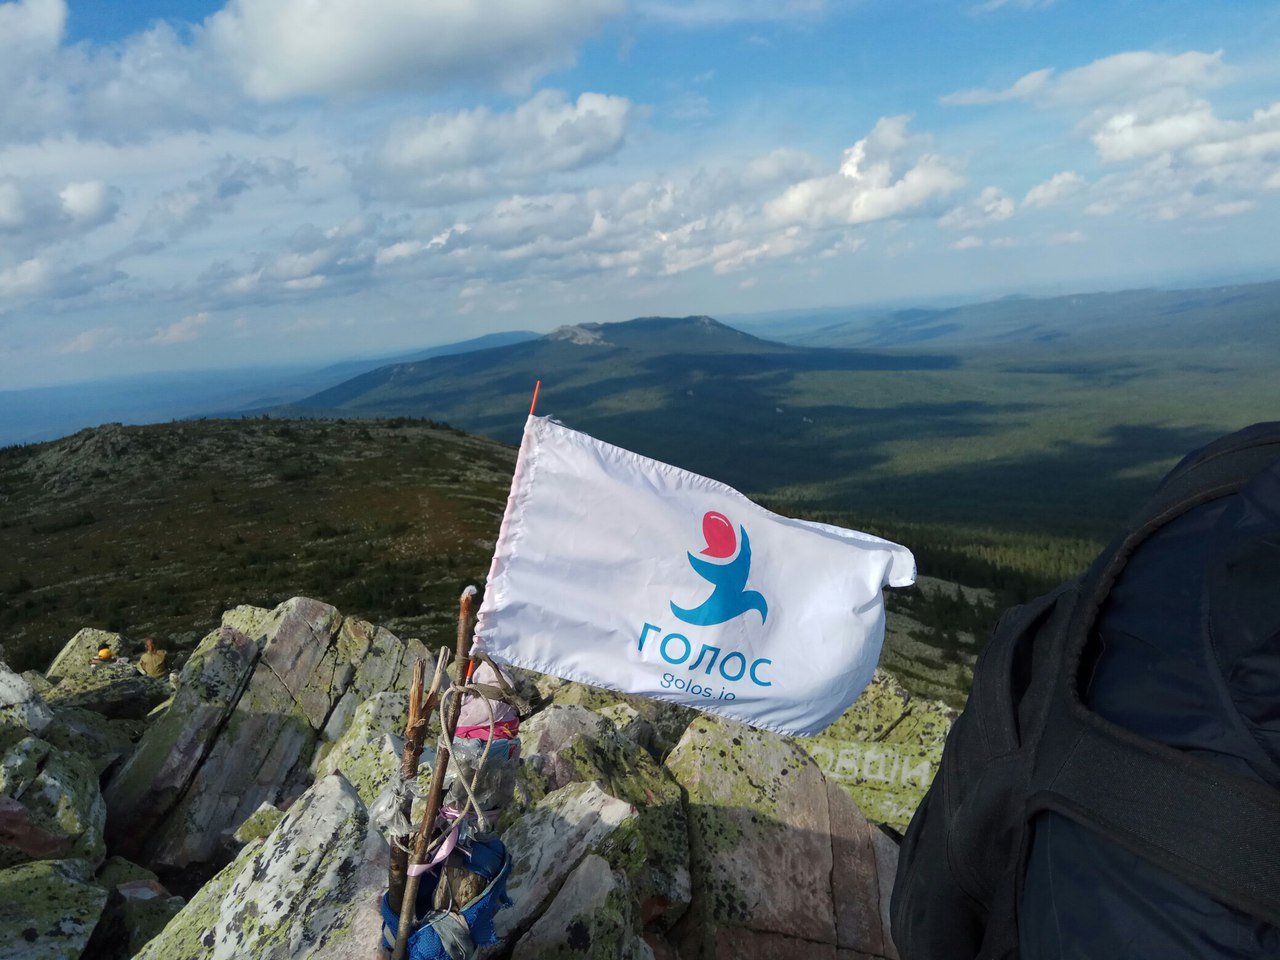 Эстафета «Знамя Голоса». Южный Урал,Таганай.